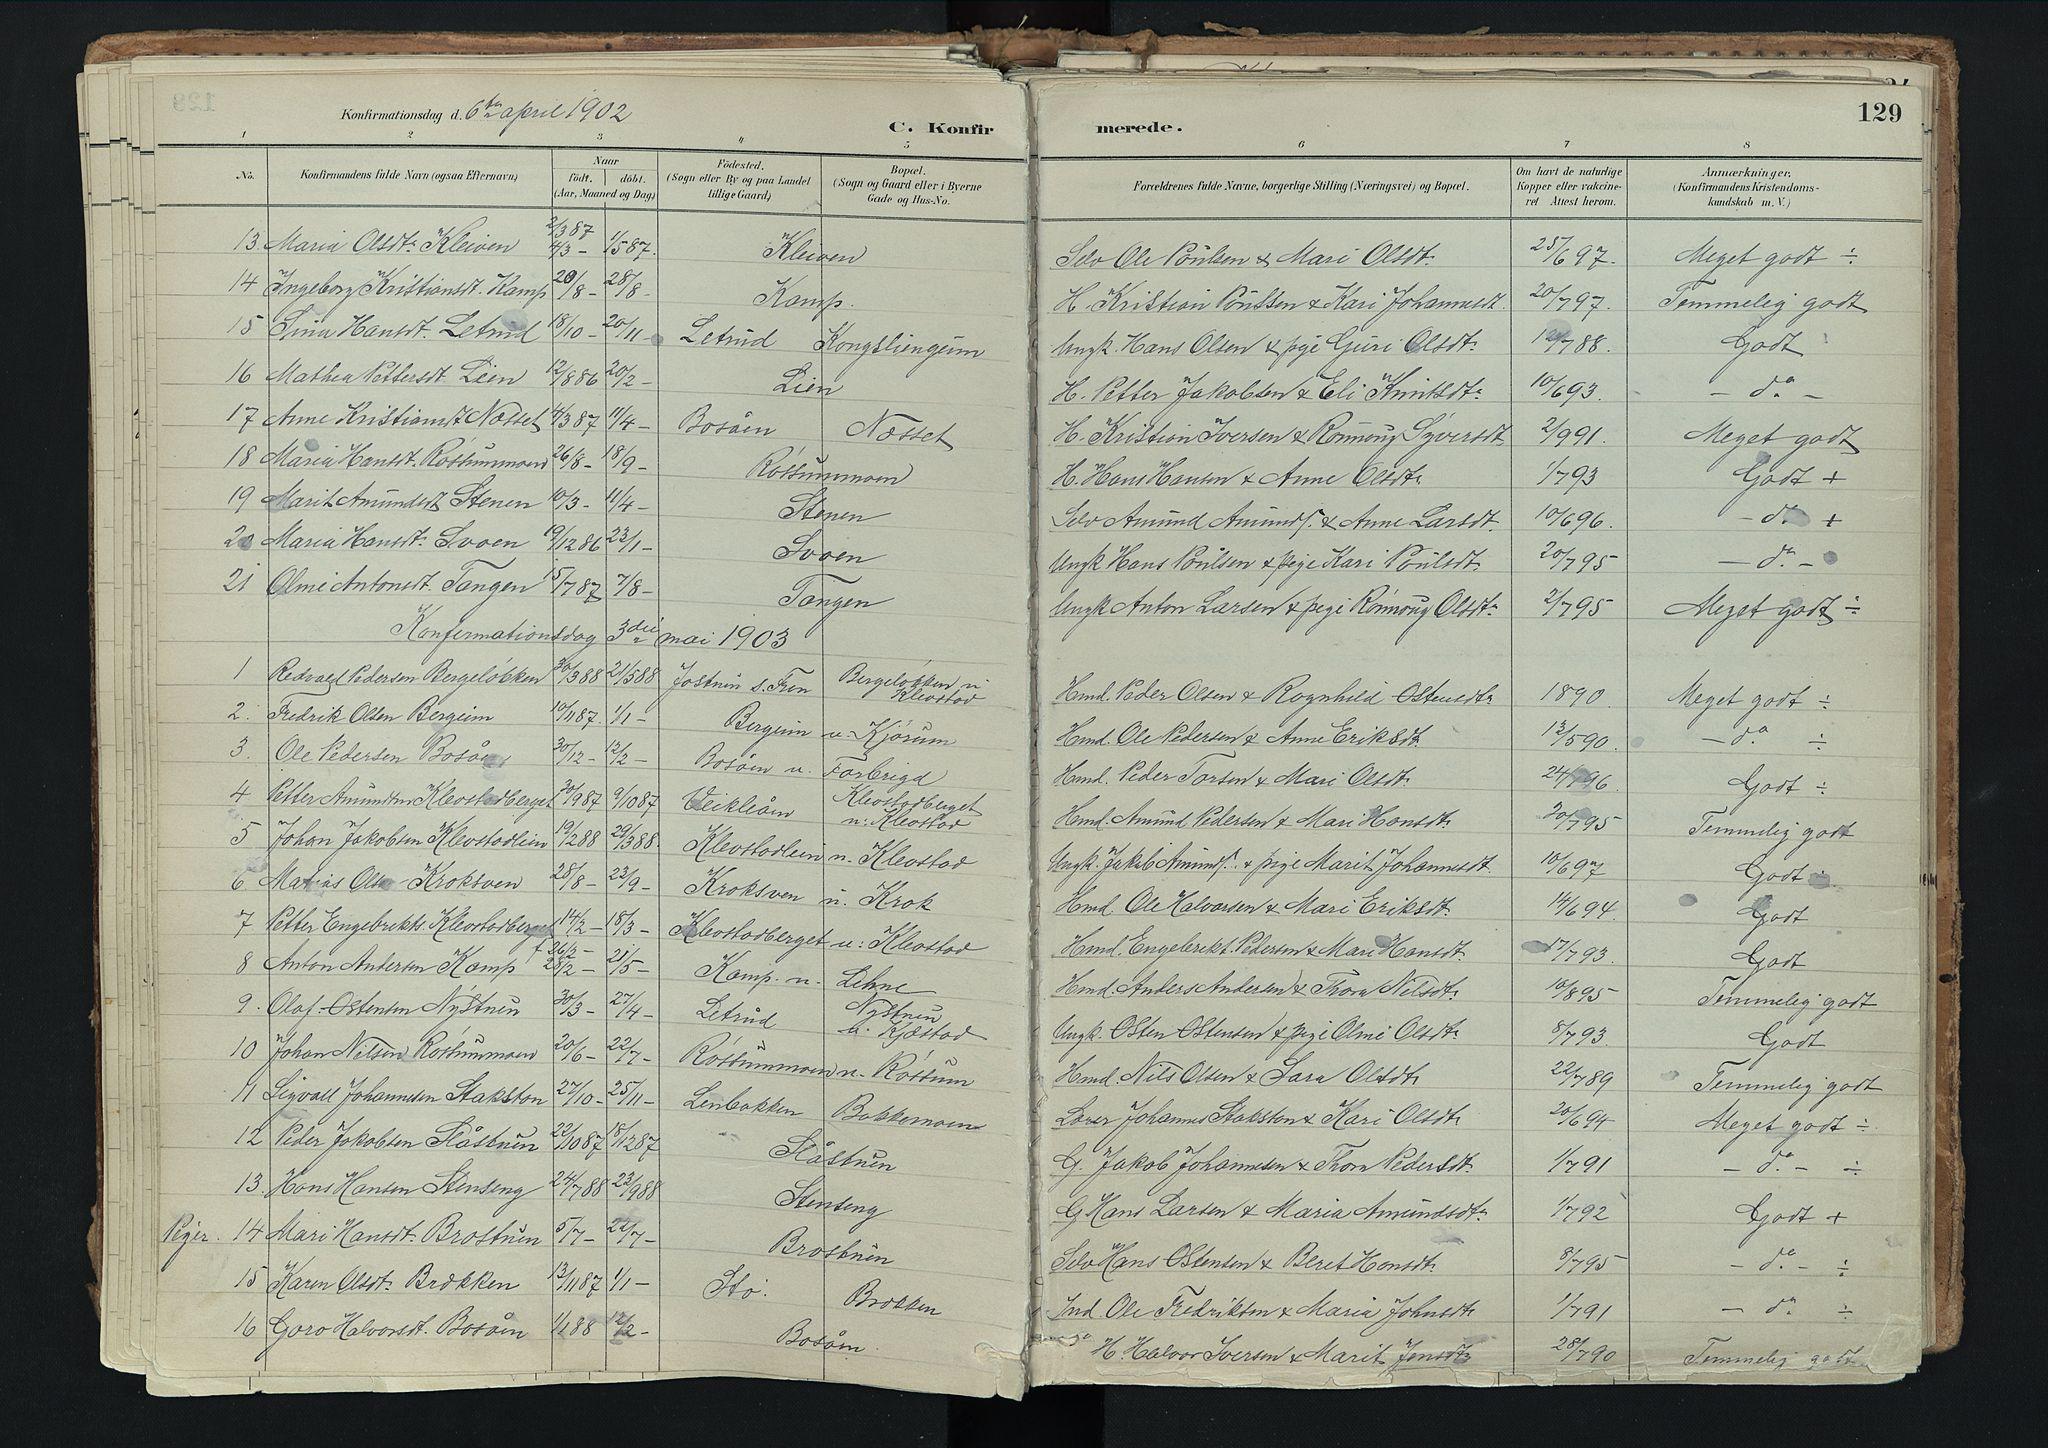 SAH, Nord-Fron prestekontor, Ministerialbok nr. 3, 1884-1914, s. 129